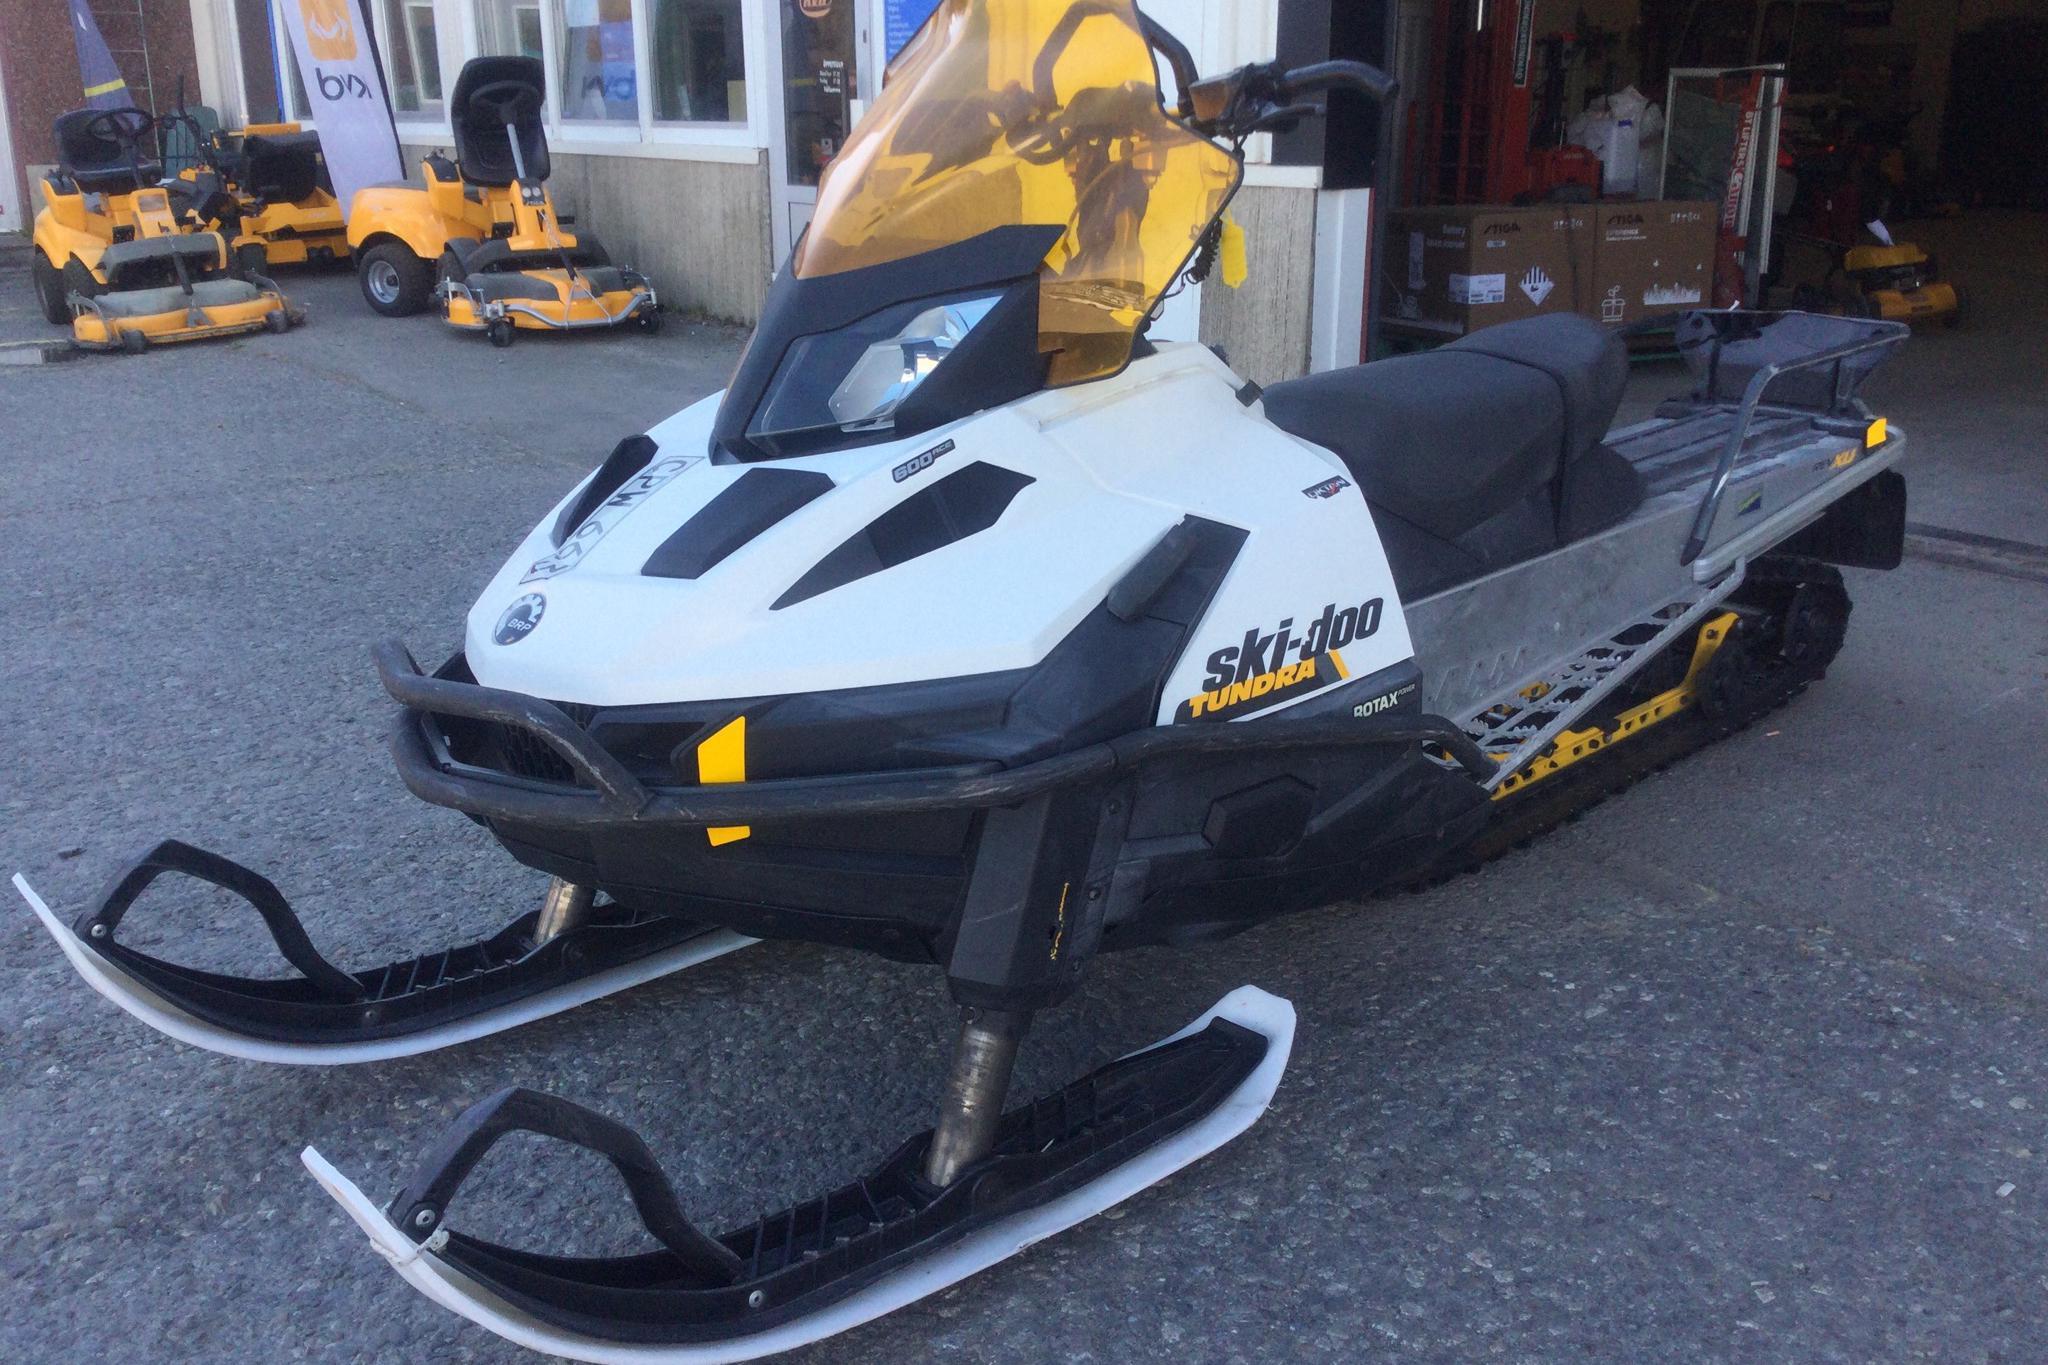 ski-doo TUNDRA LT 600 ACE Snöskoter - 988 mil - Automat - 2015